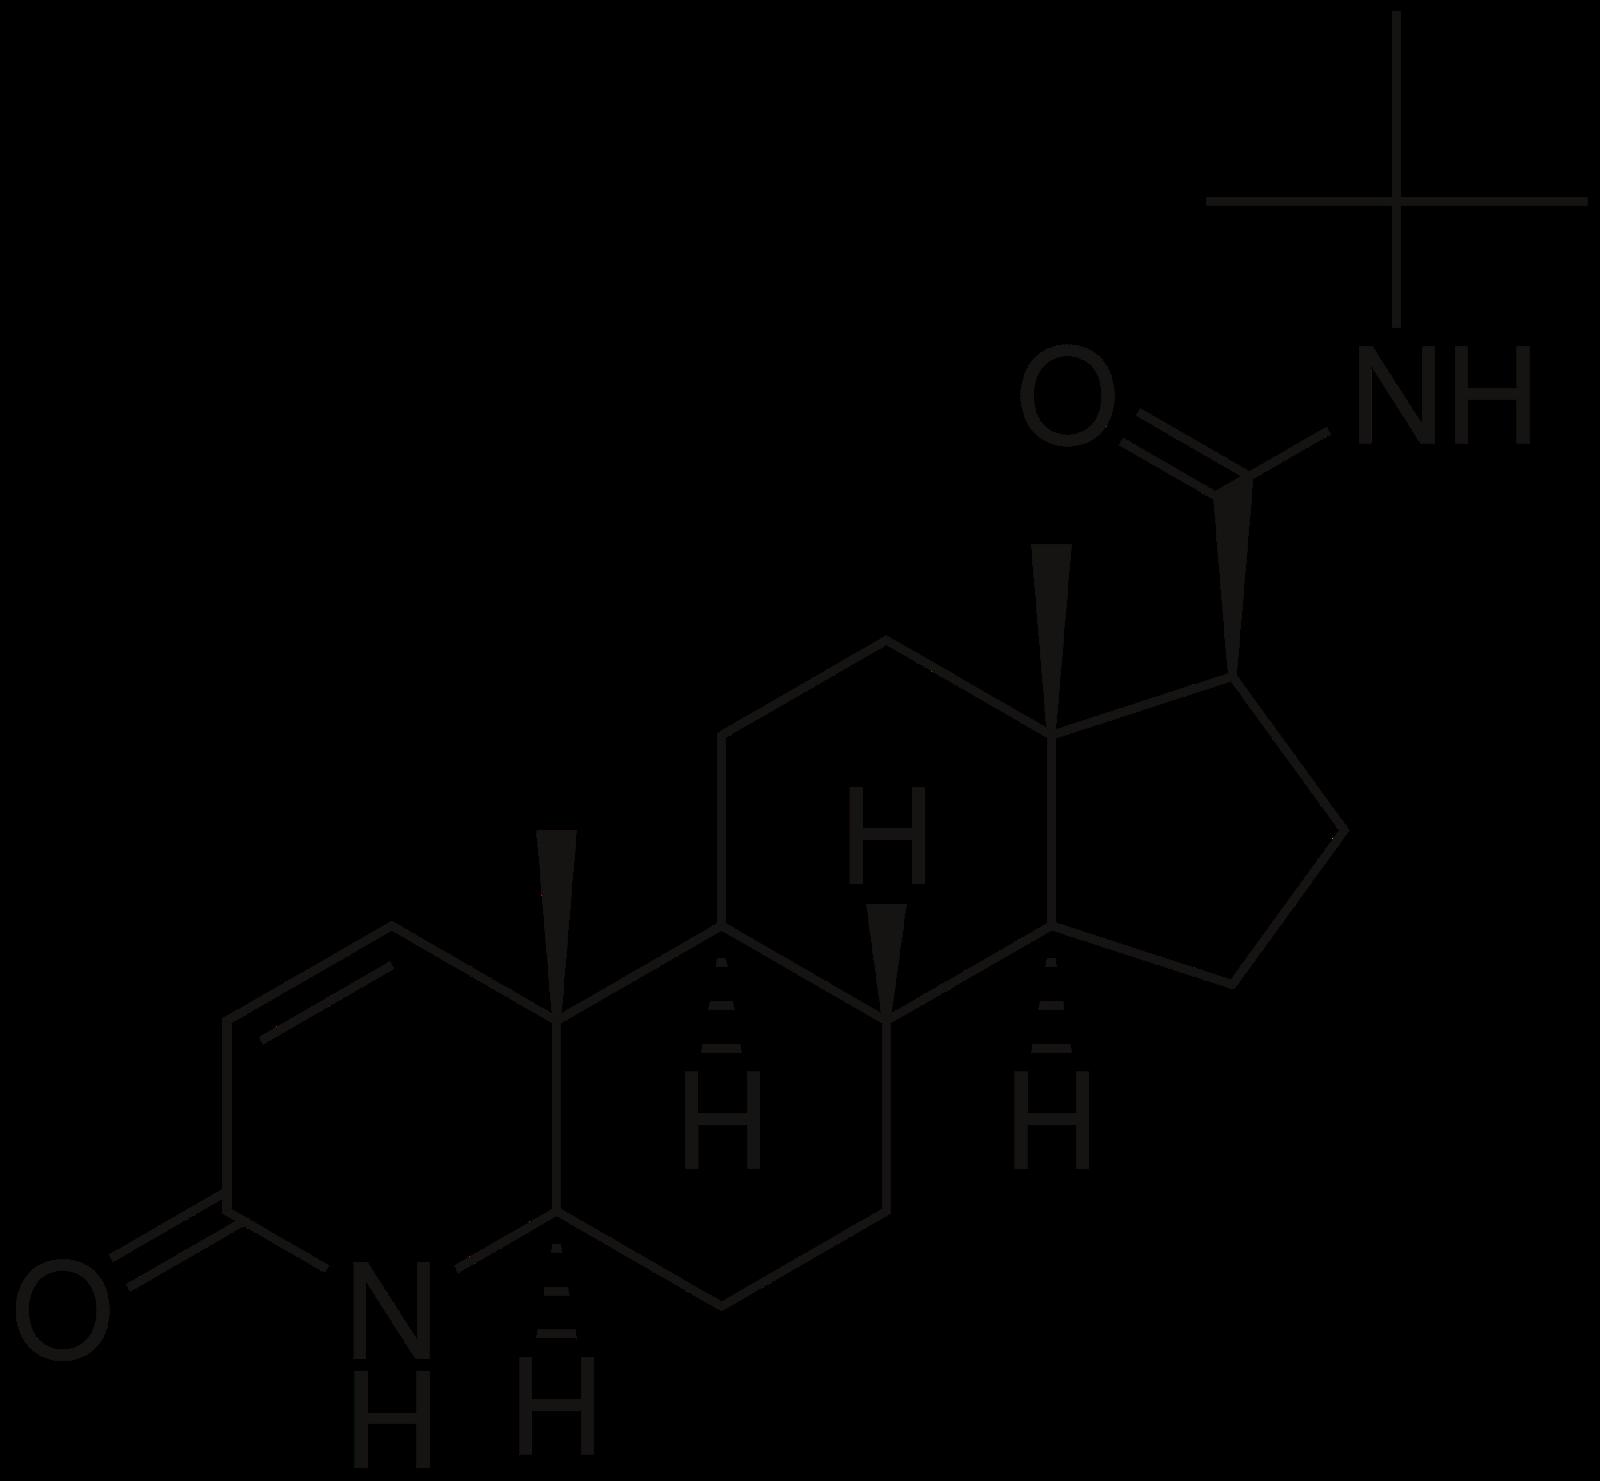 finasteride side effects, finasteride 5mg